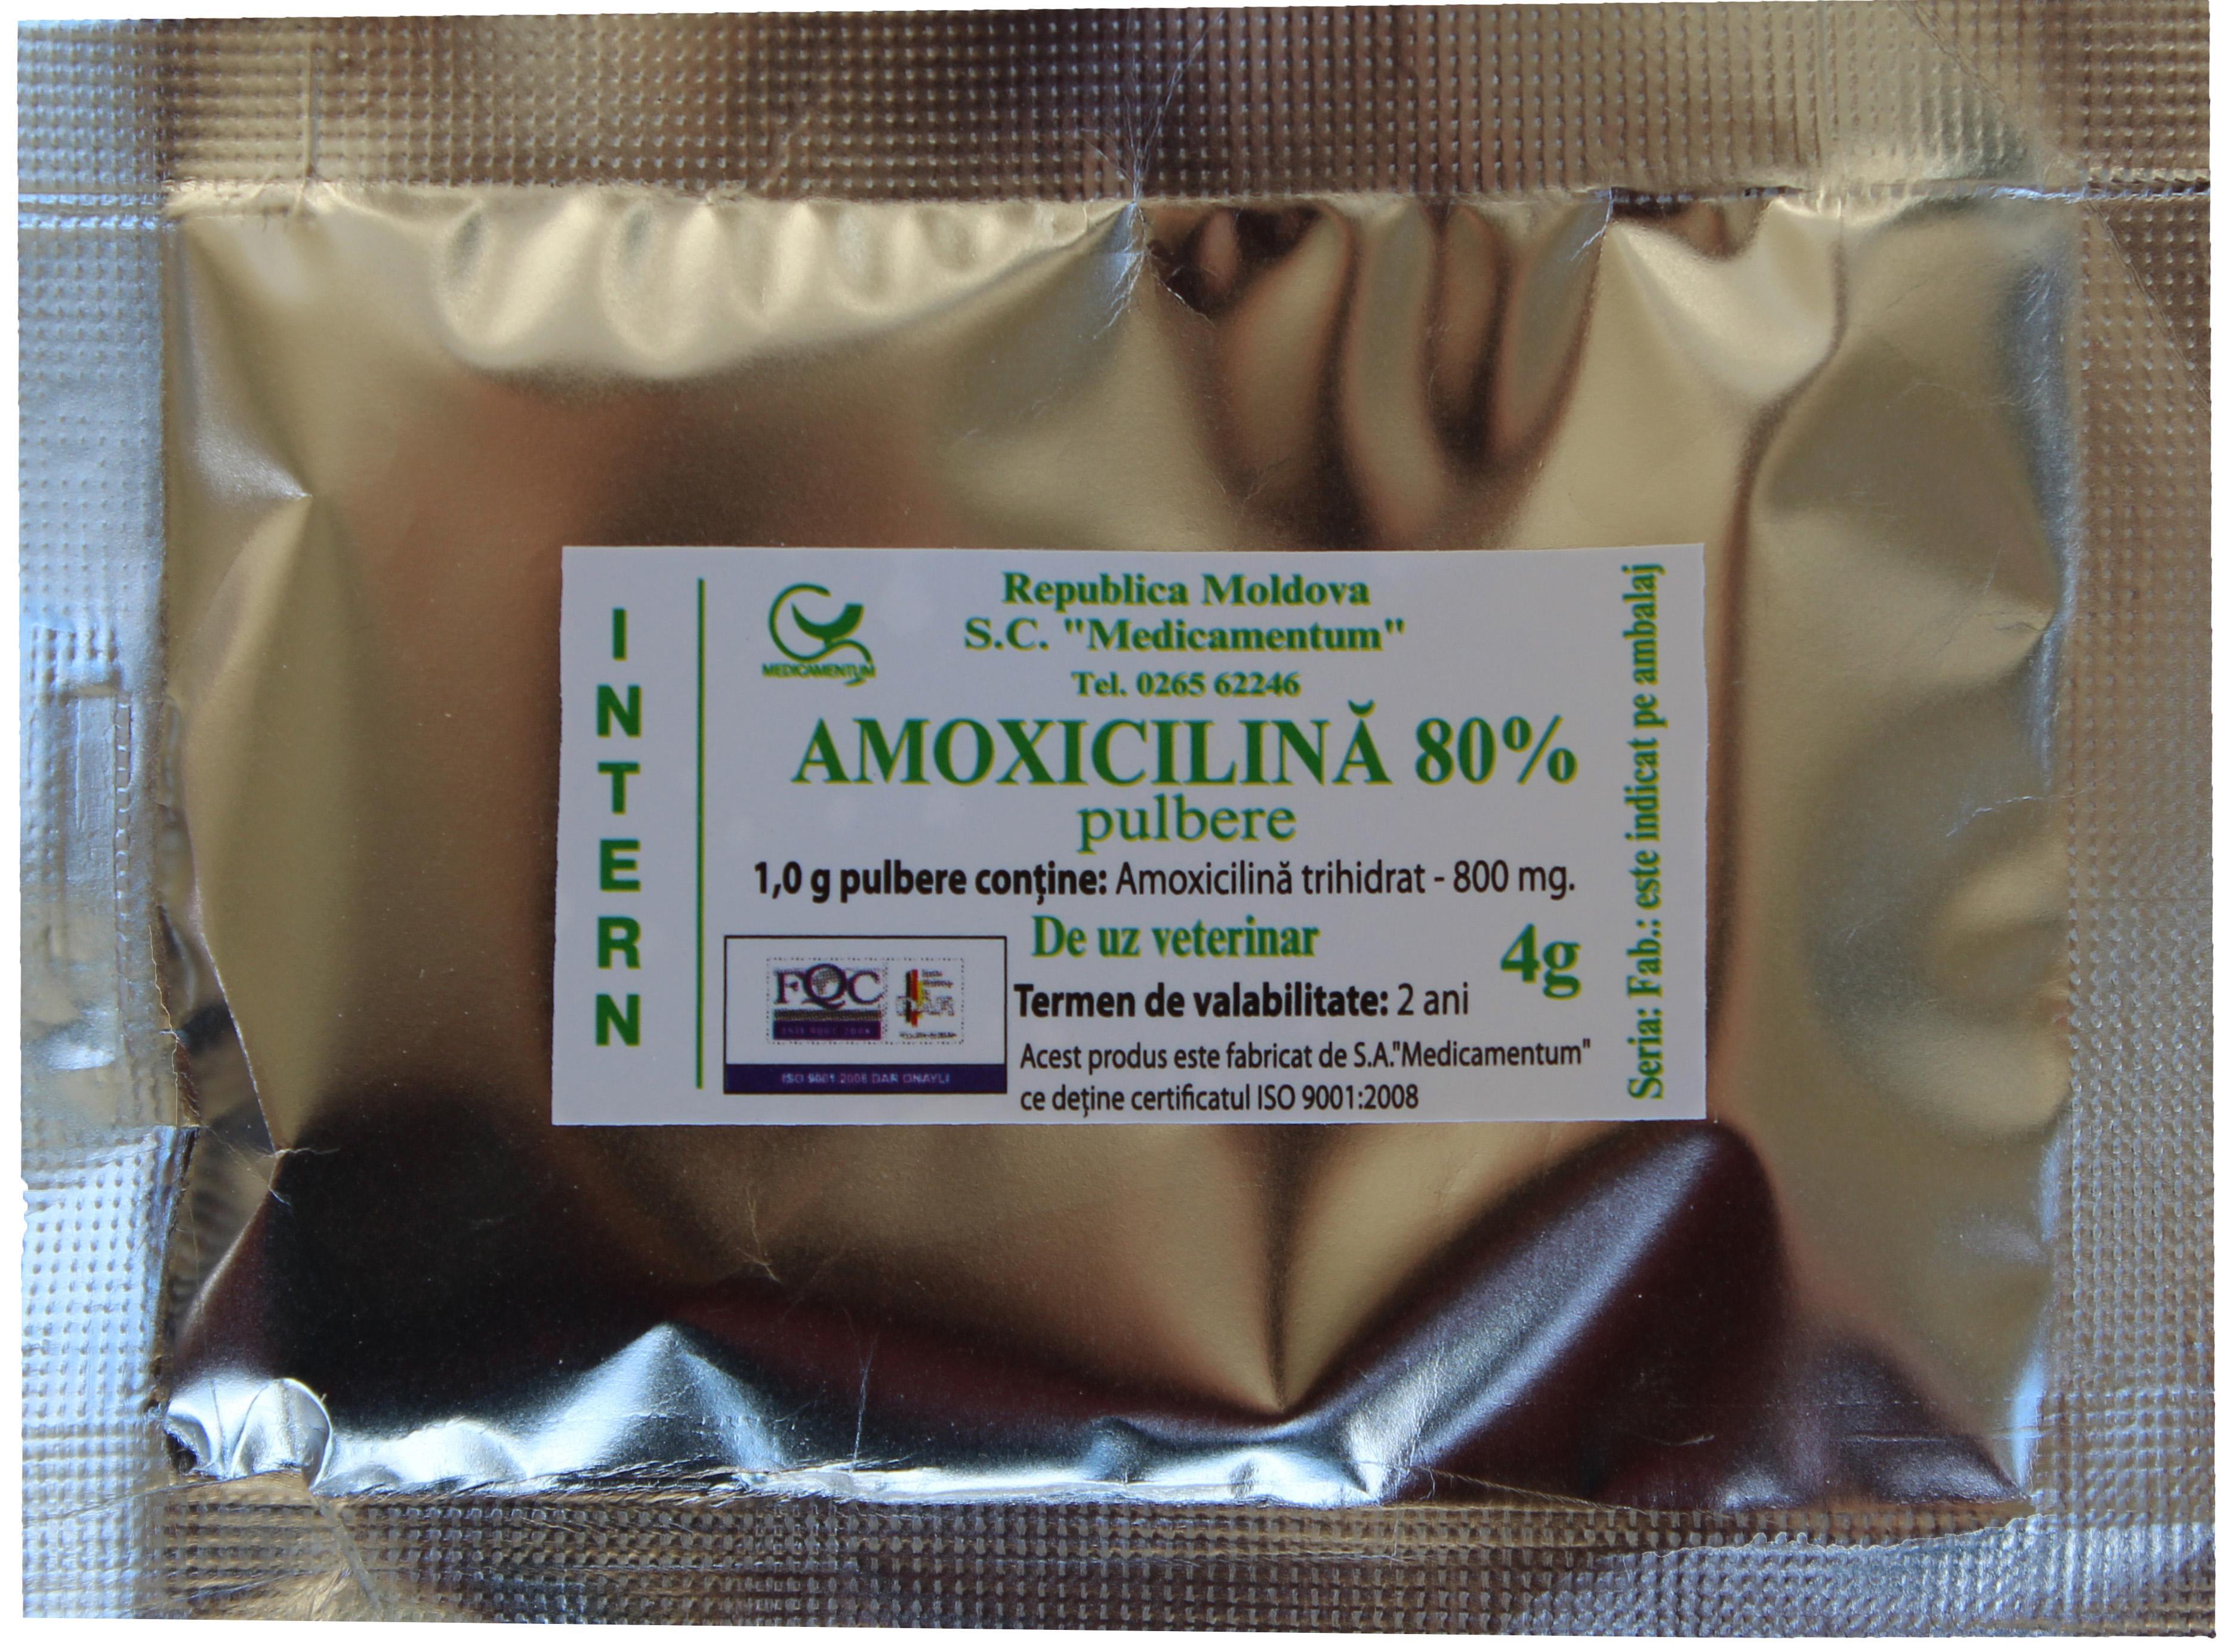 Amoxicillin Powder 80 Medicamentum Products Made In Moldova